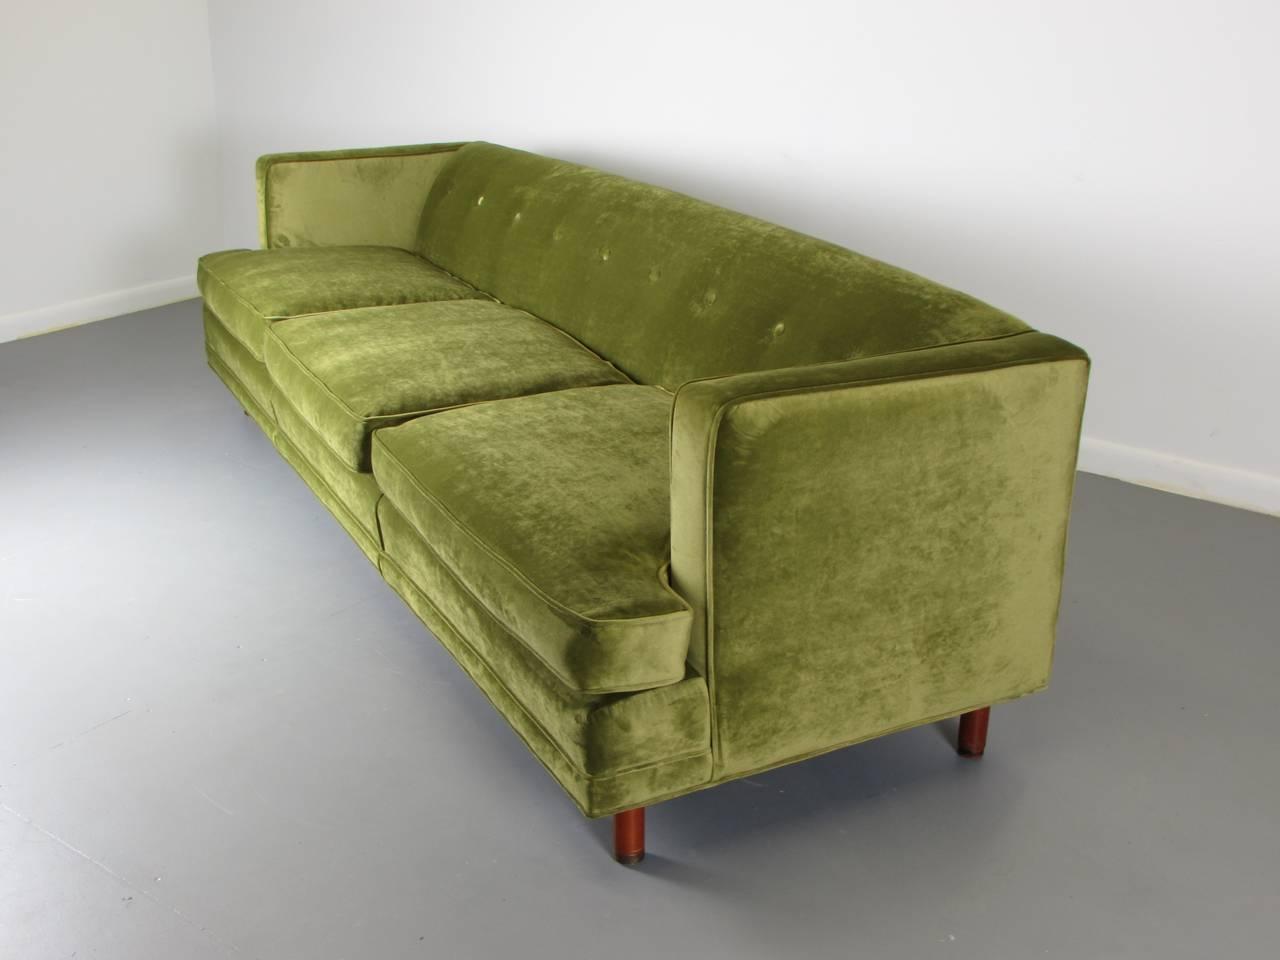 Striking Velvet Tuxedo Sofa In The Style Of Edward Wormley 1960s Legs Are Walnut